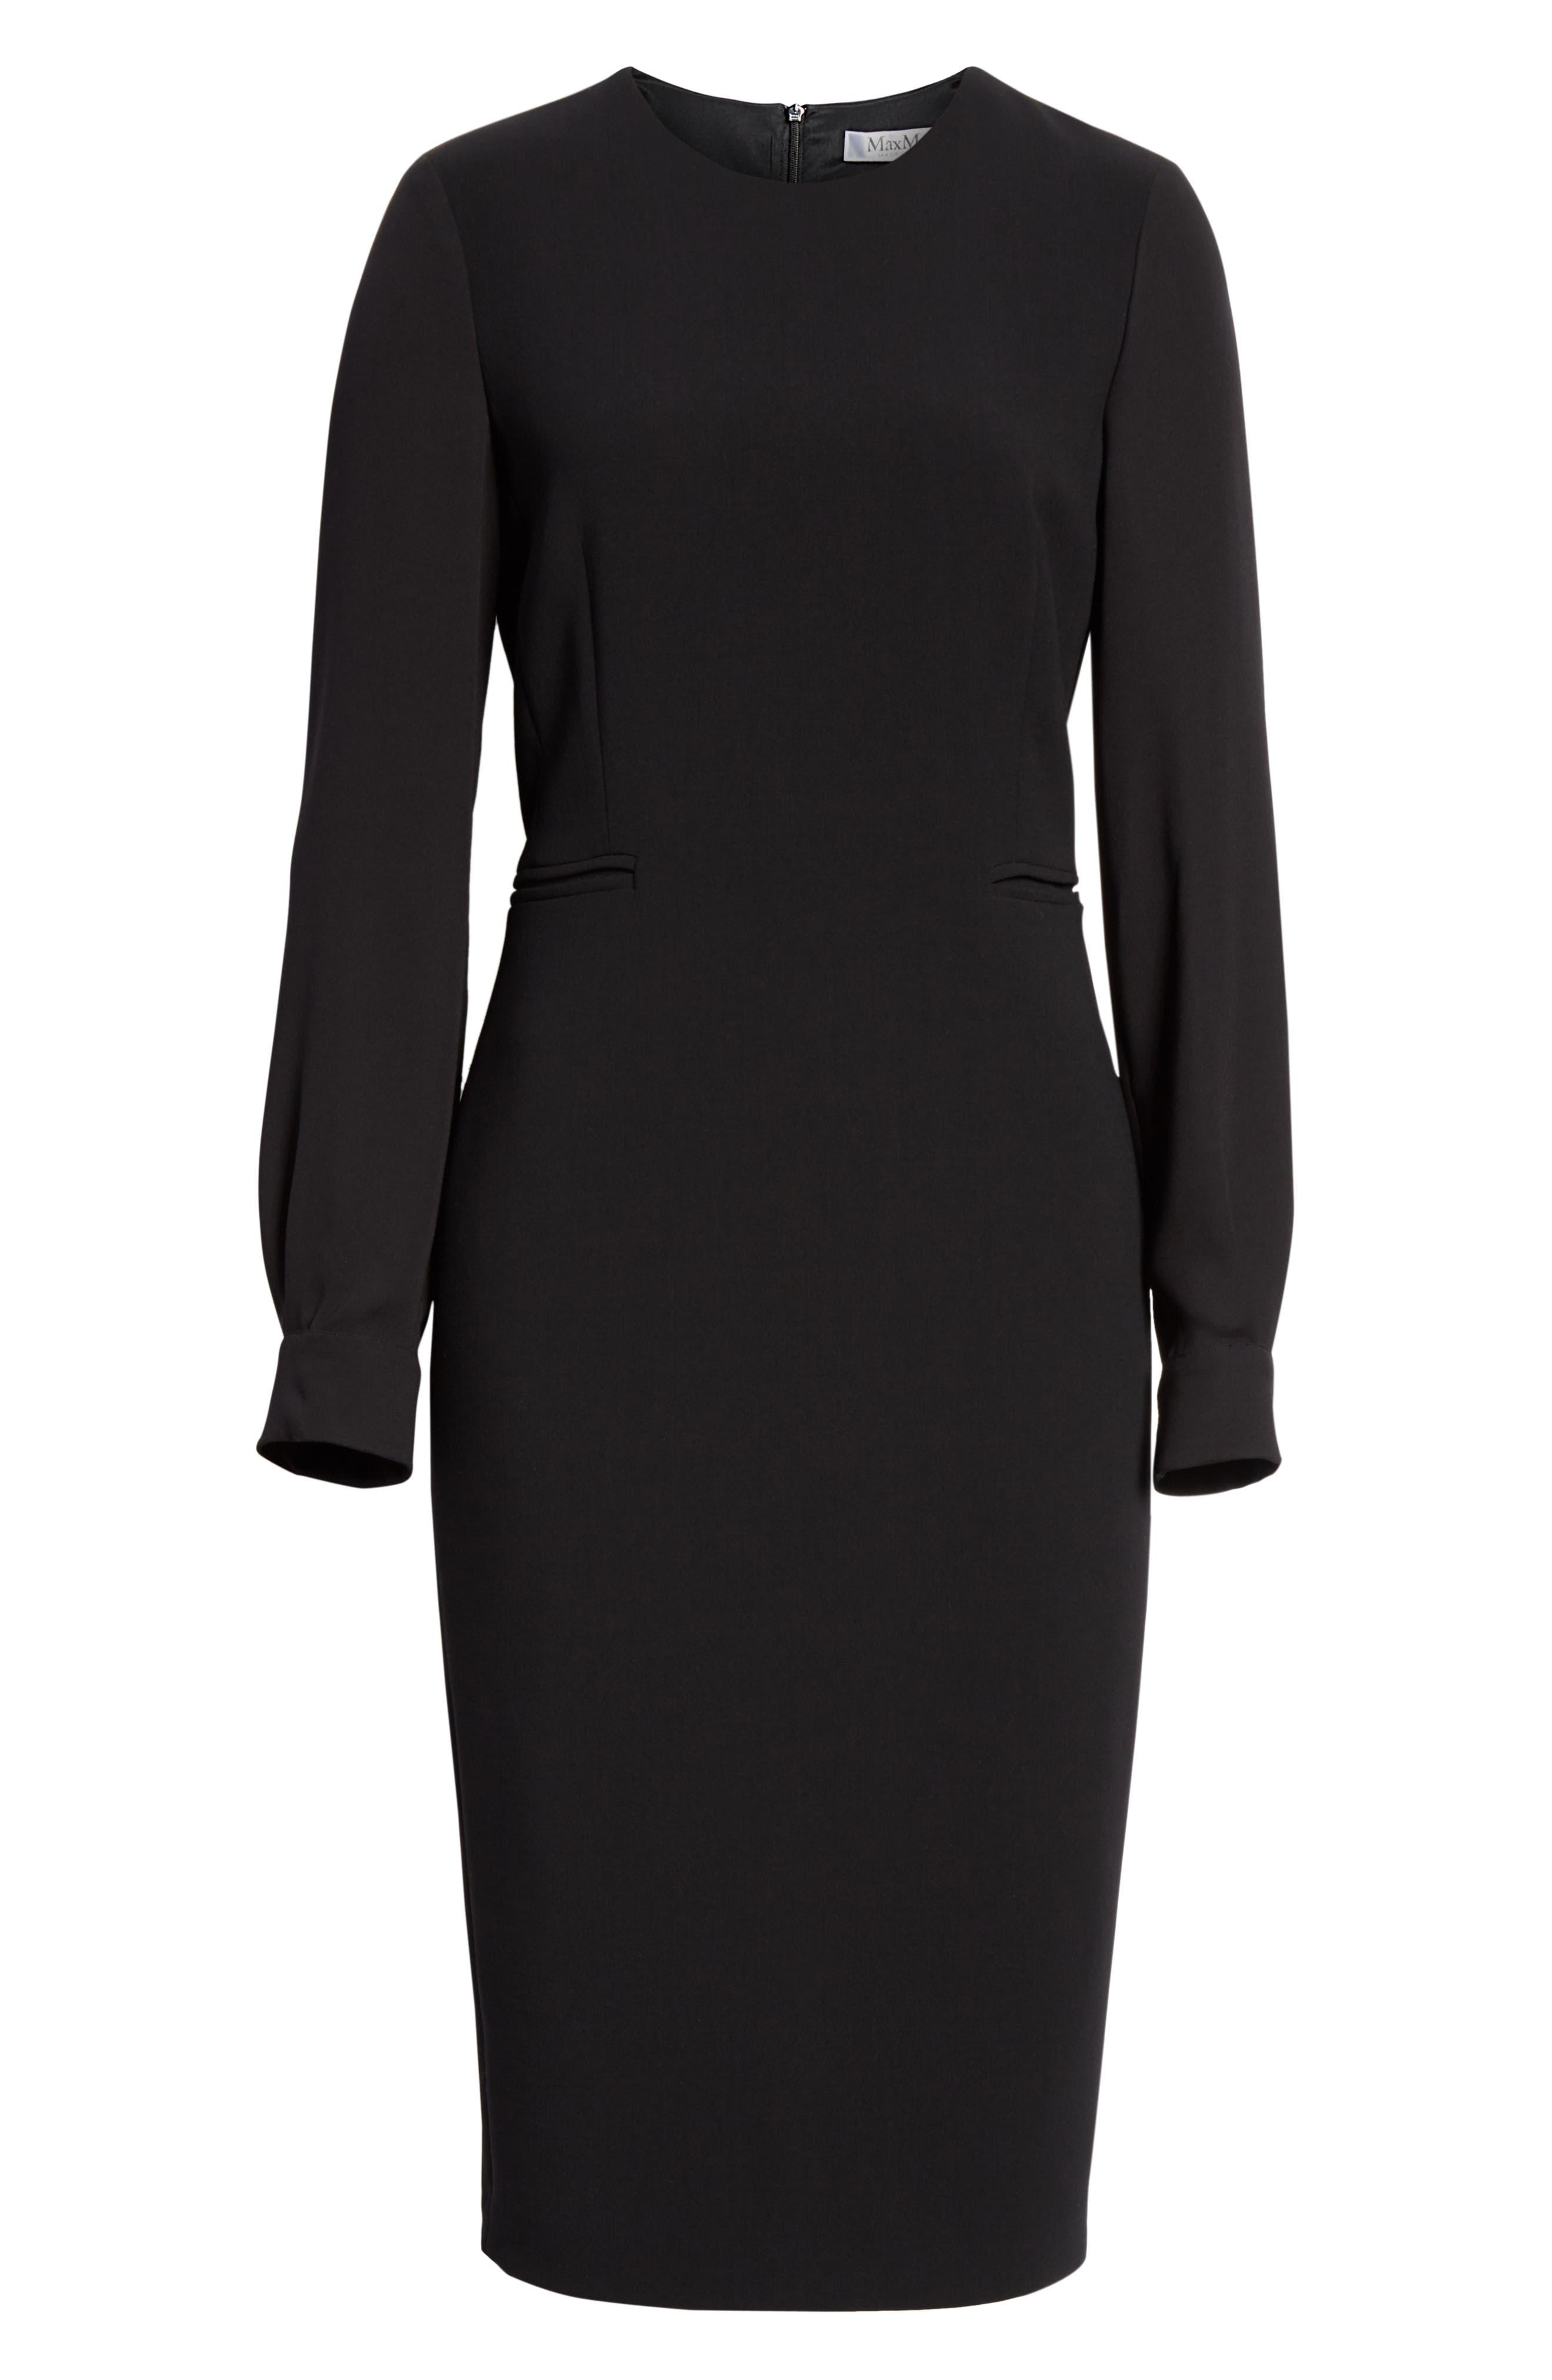 Ottelia Stretch Wool Sheath Dress,                             Alternate thumbnail 6, color,                             BLACK